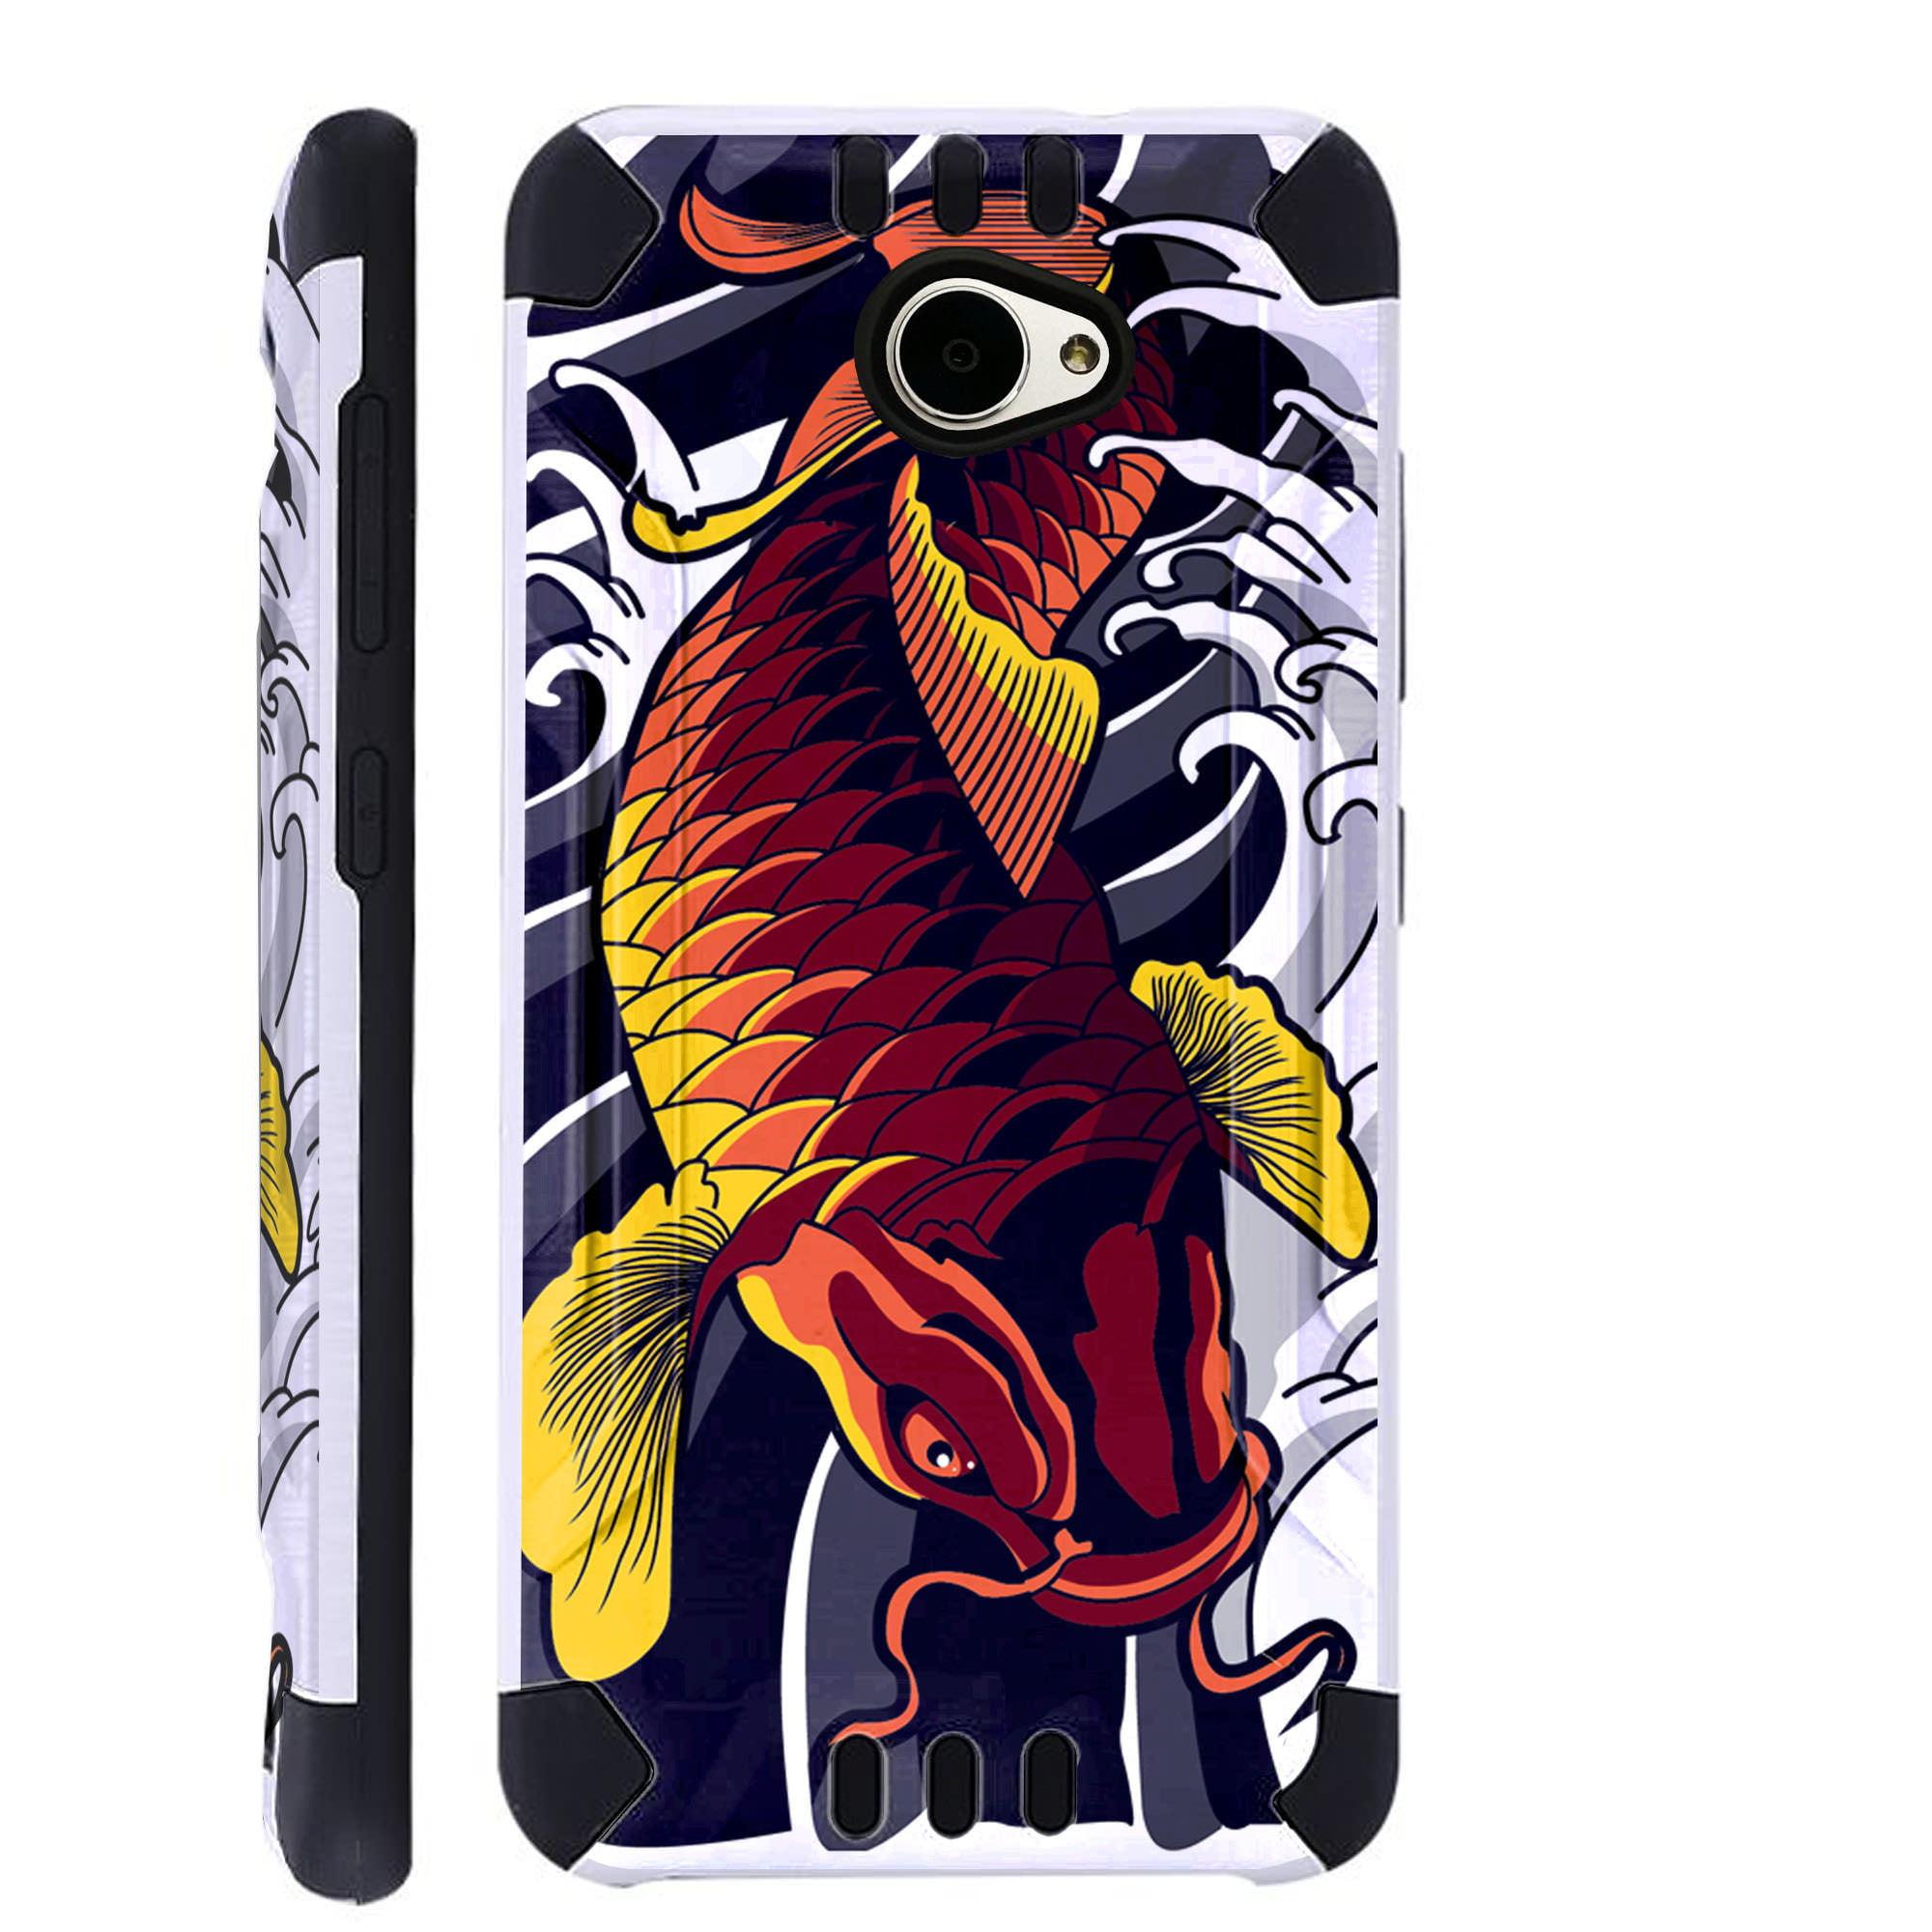 For Huawei Ascend XT2 / Huawei Ascend XT 2 / Huawei Elate 4G Case Brushed Metal Texture Hybrid TPU KombatGuard Phone Cover (Red Koi Fish)